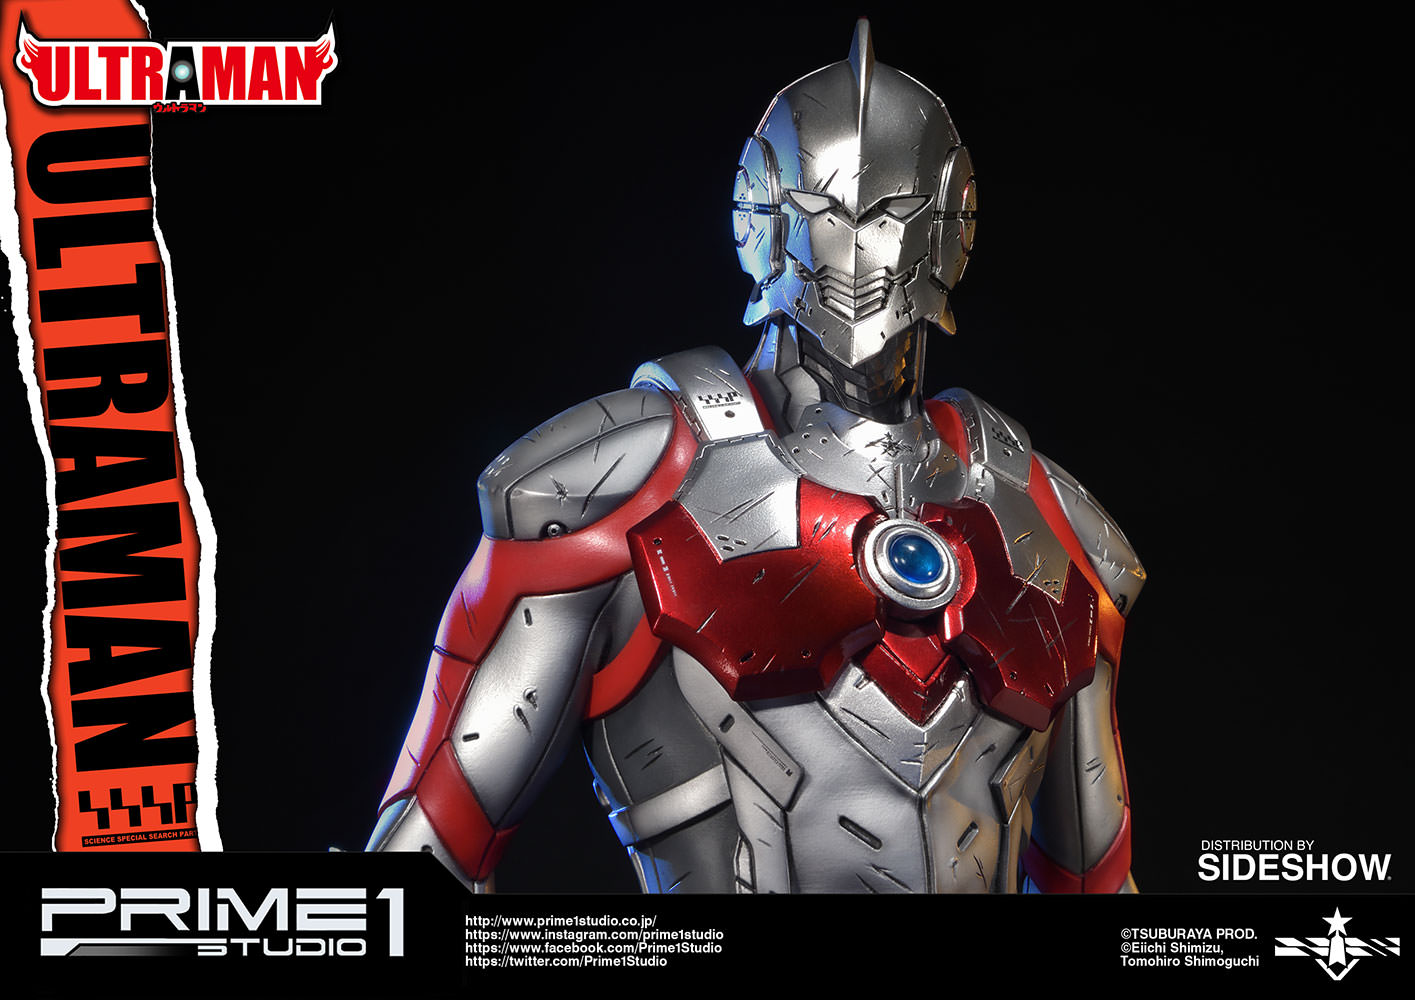 Ultraman Ultraman Statue by Prime 1 Studio   Sideshow ...